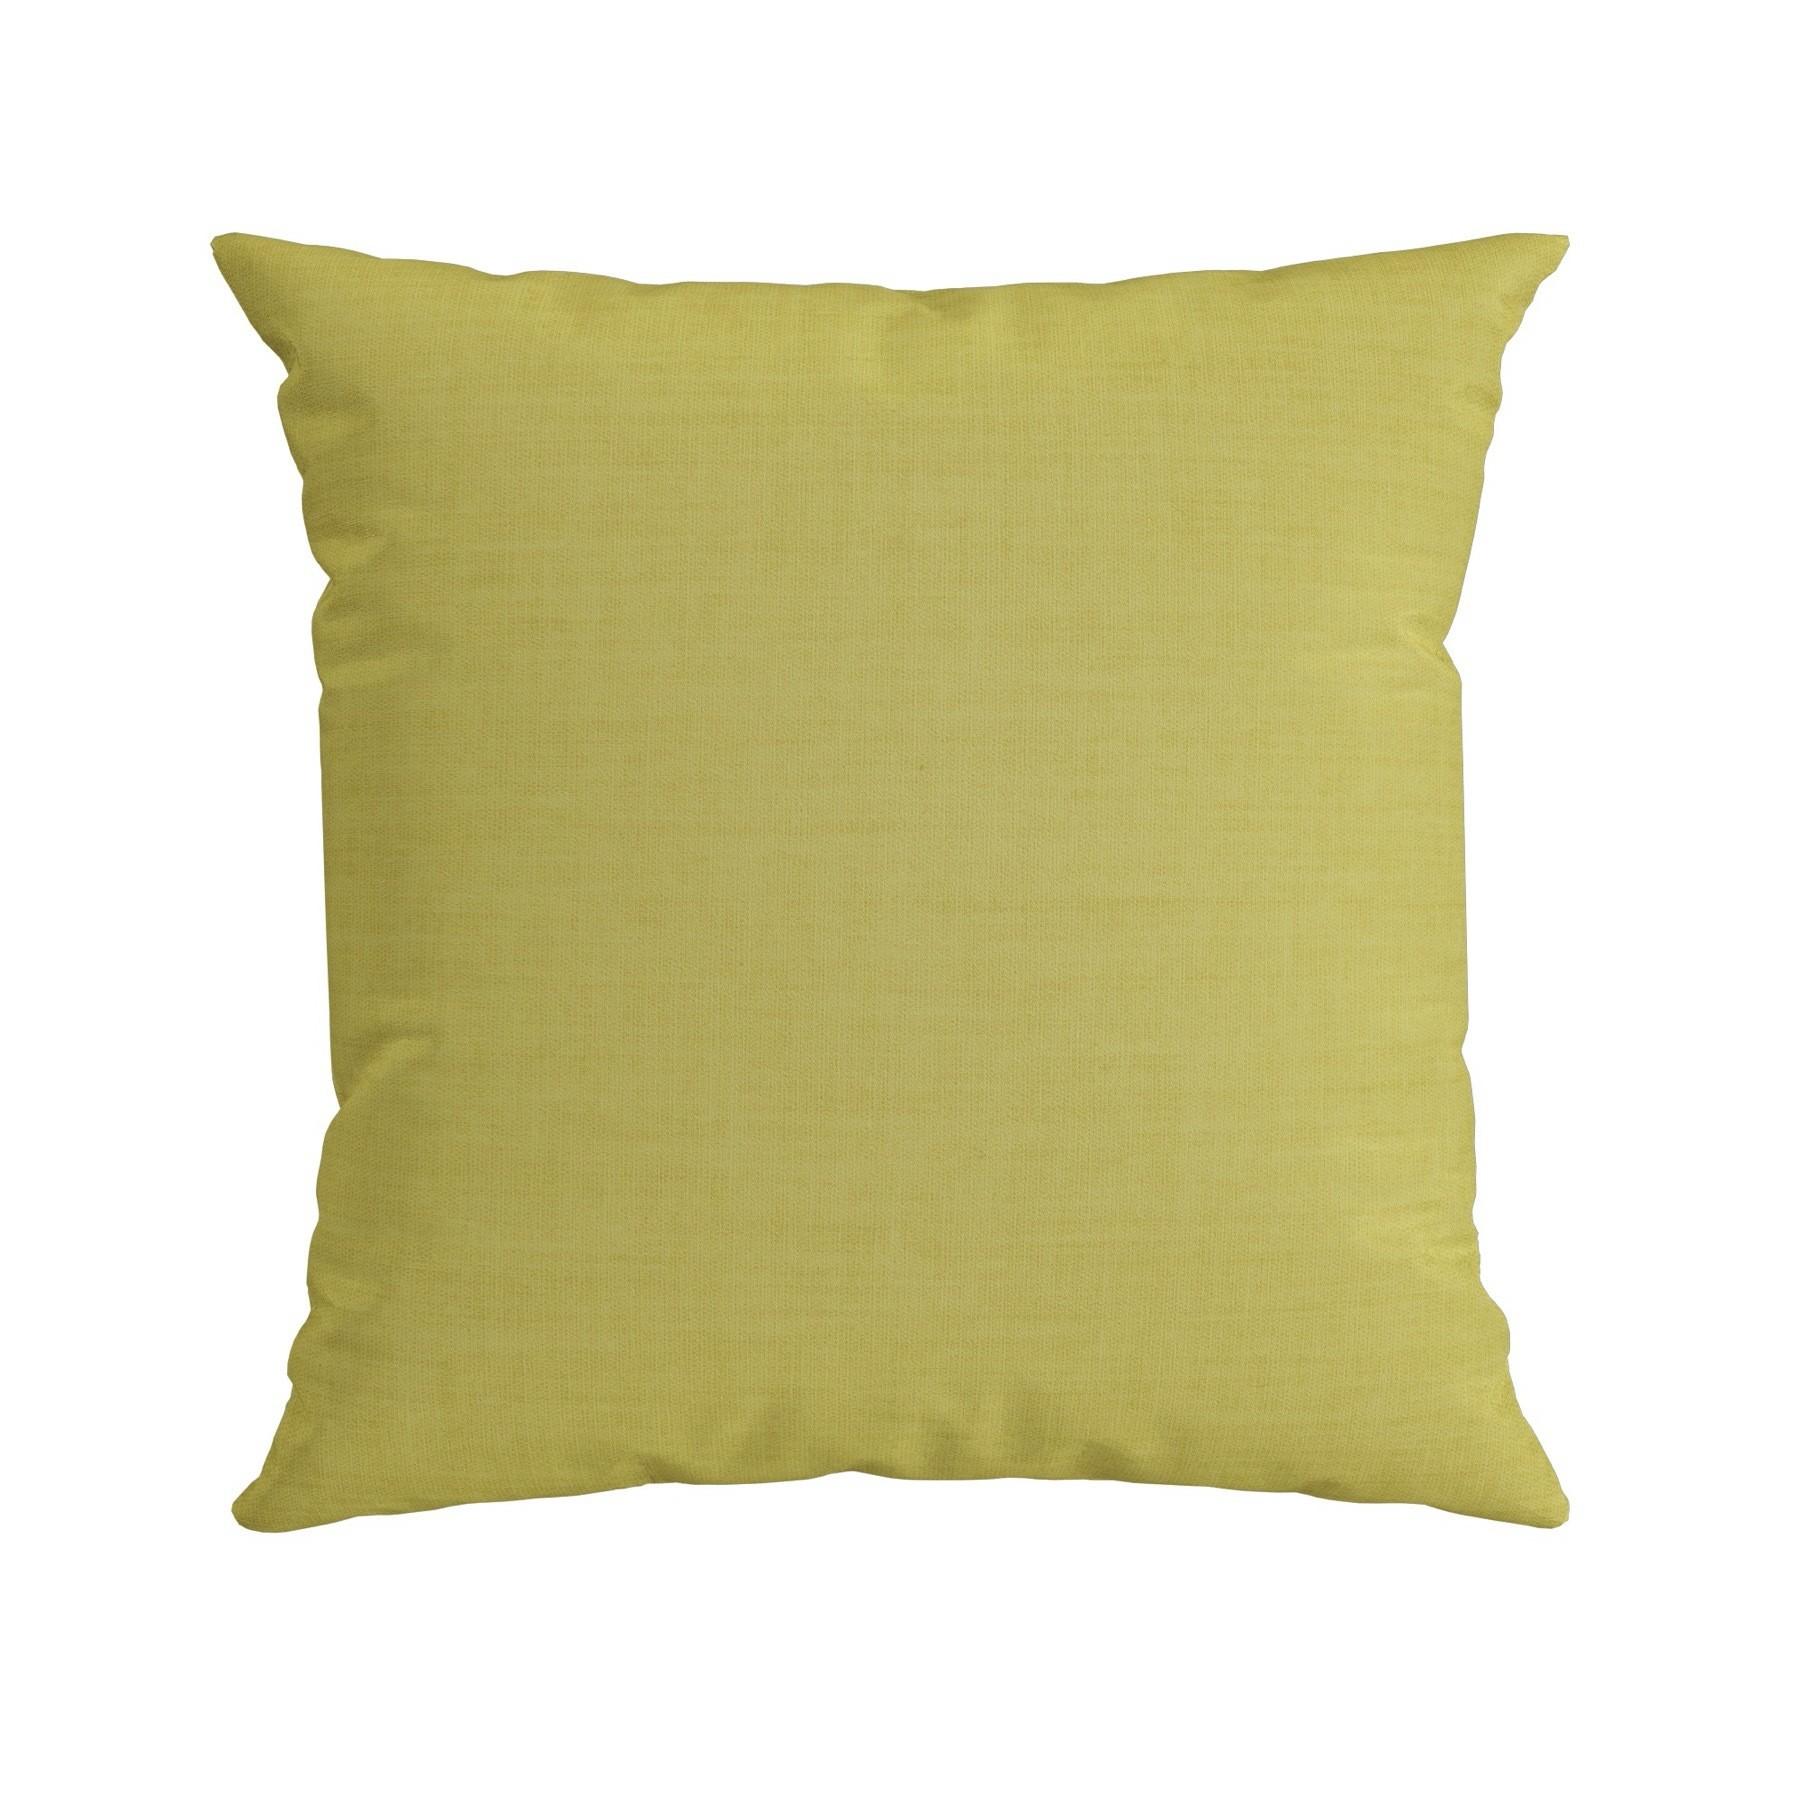 Almofada Outdoor 43x43cm Amarela - Belchior